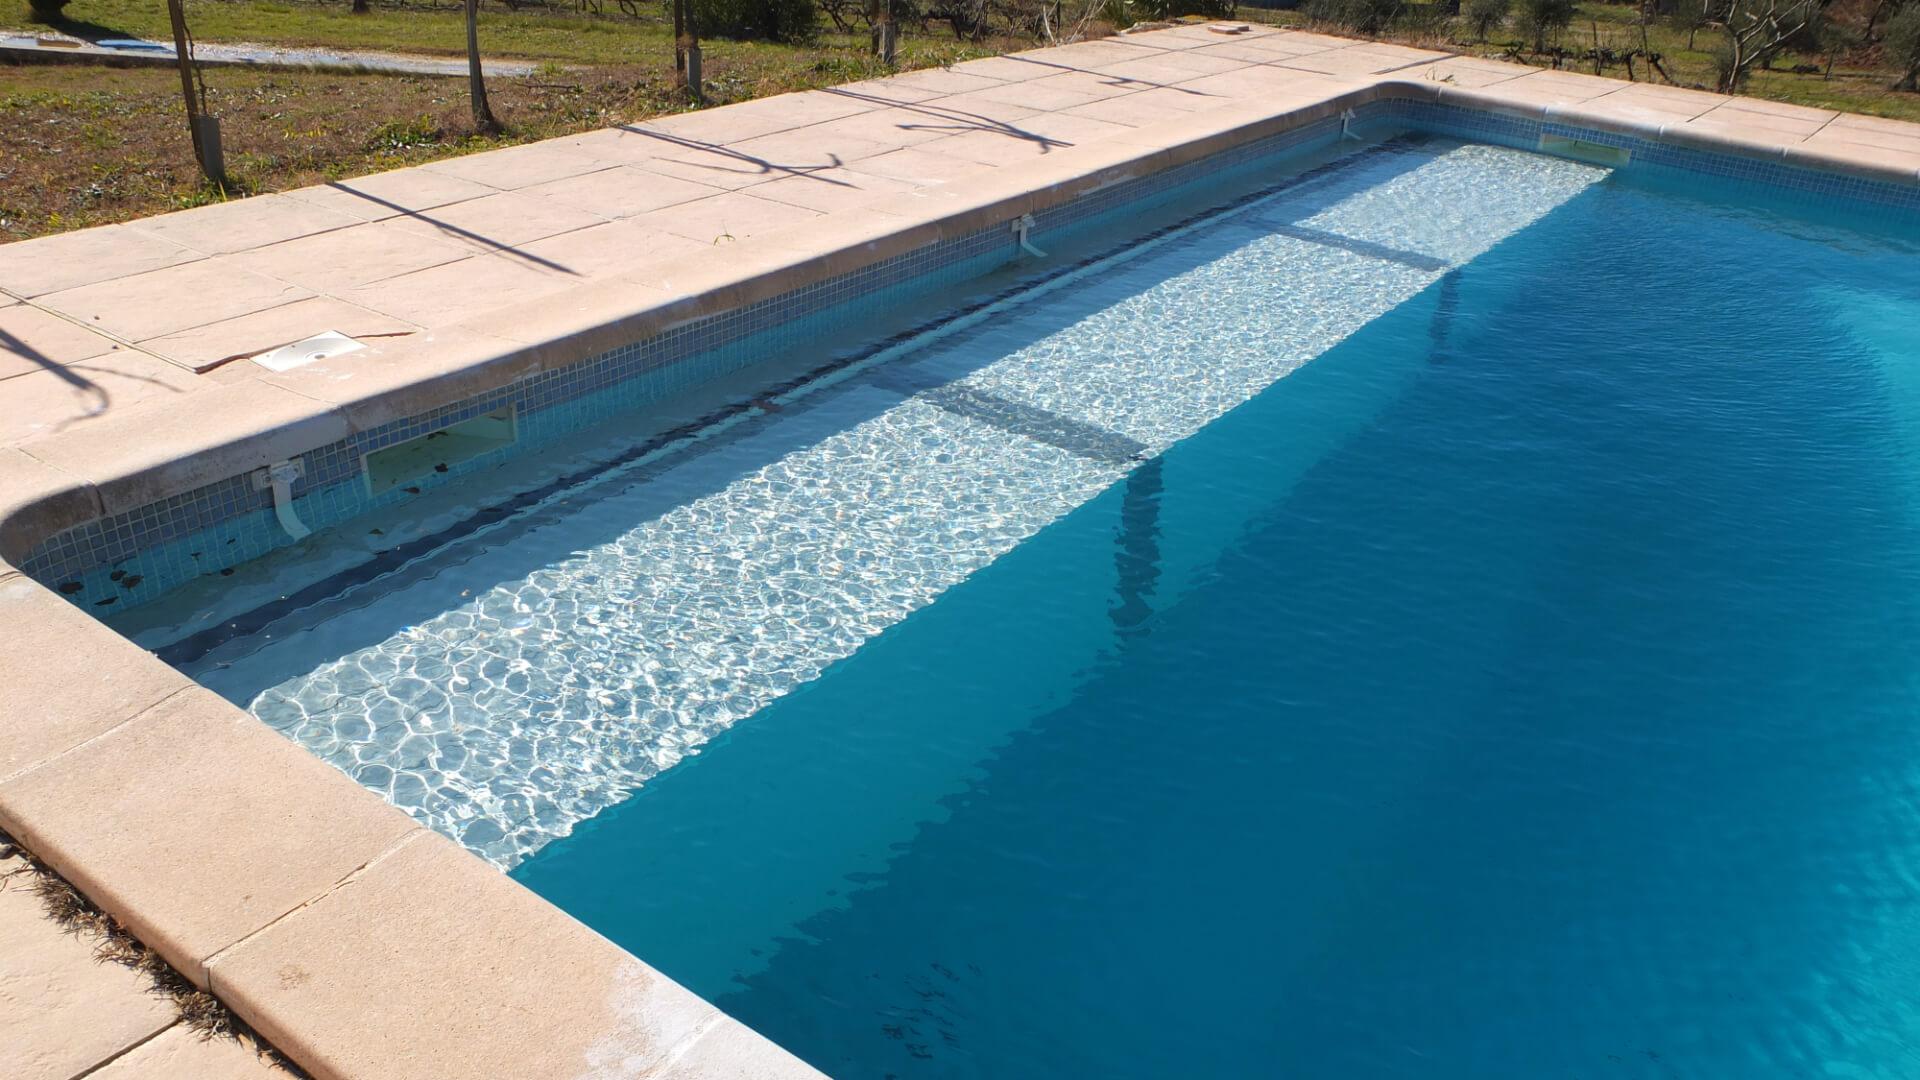 volet piscine ne s'ouvre plus